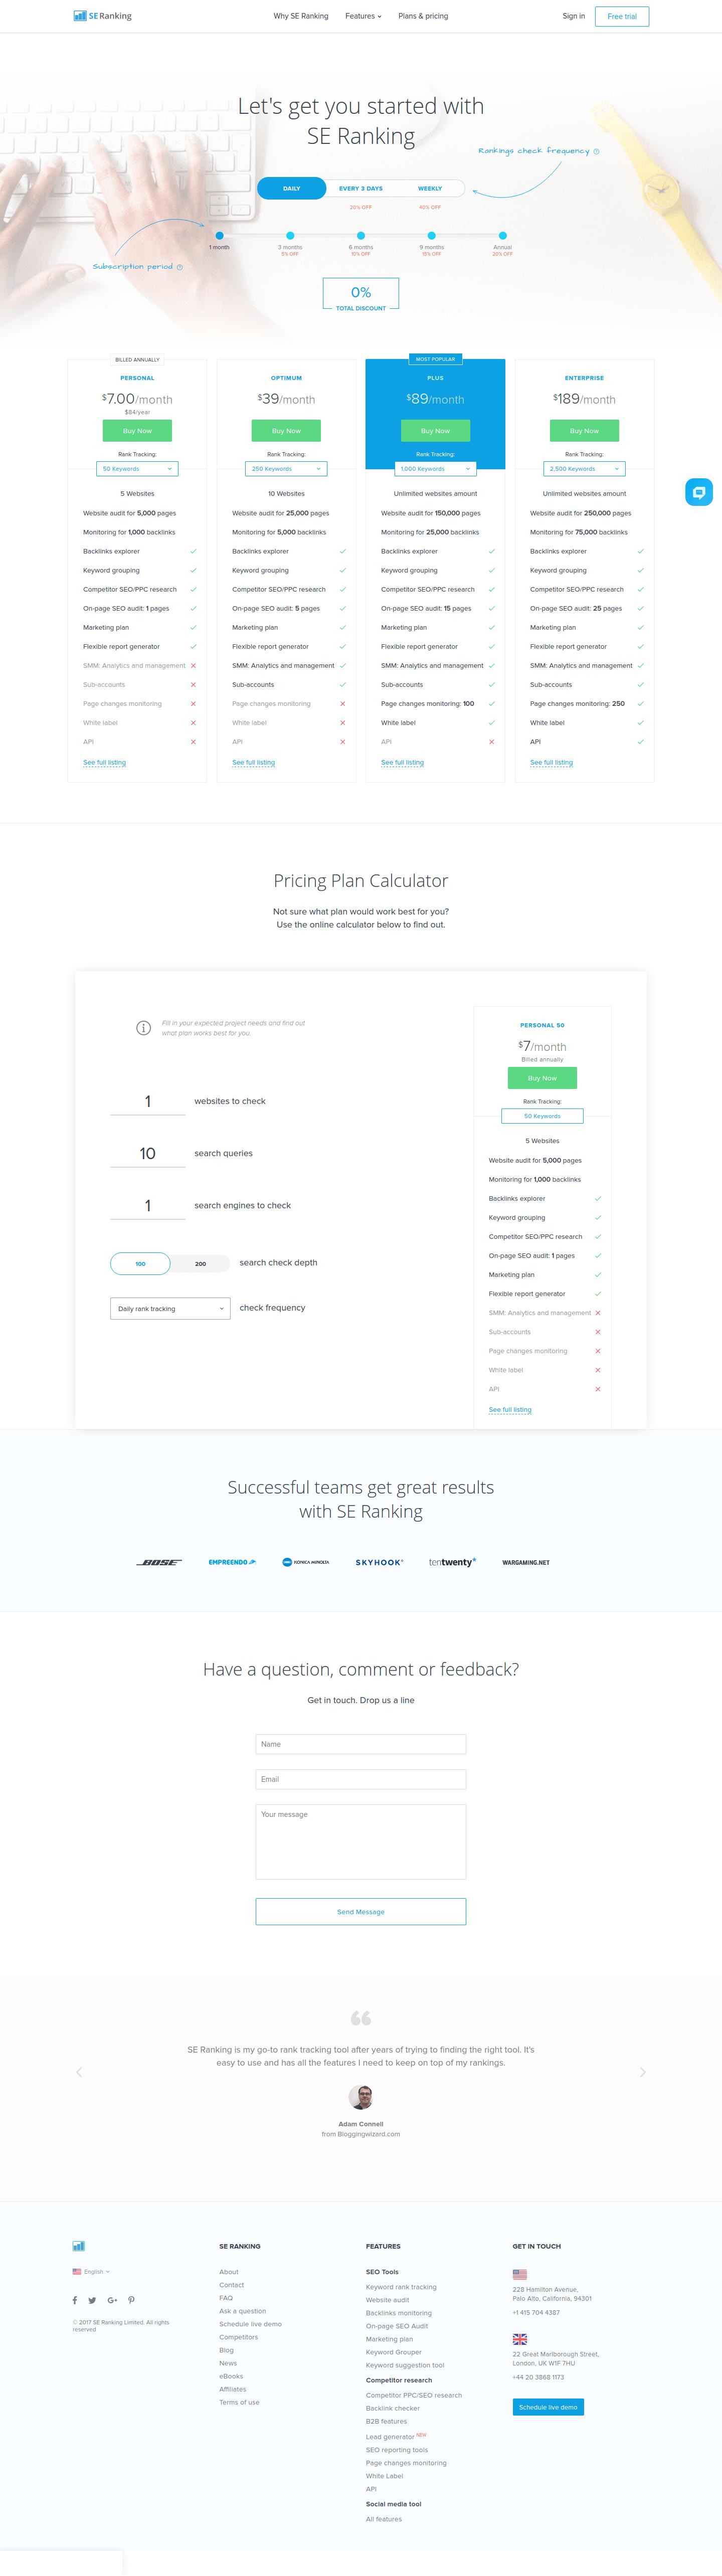 seranking.com-pricing-full